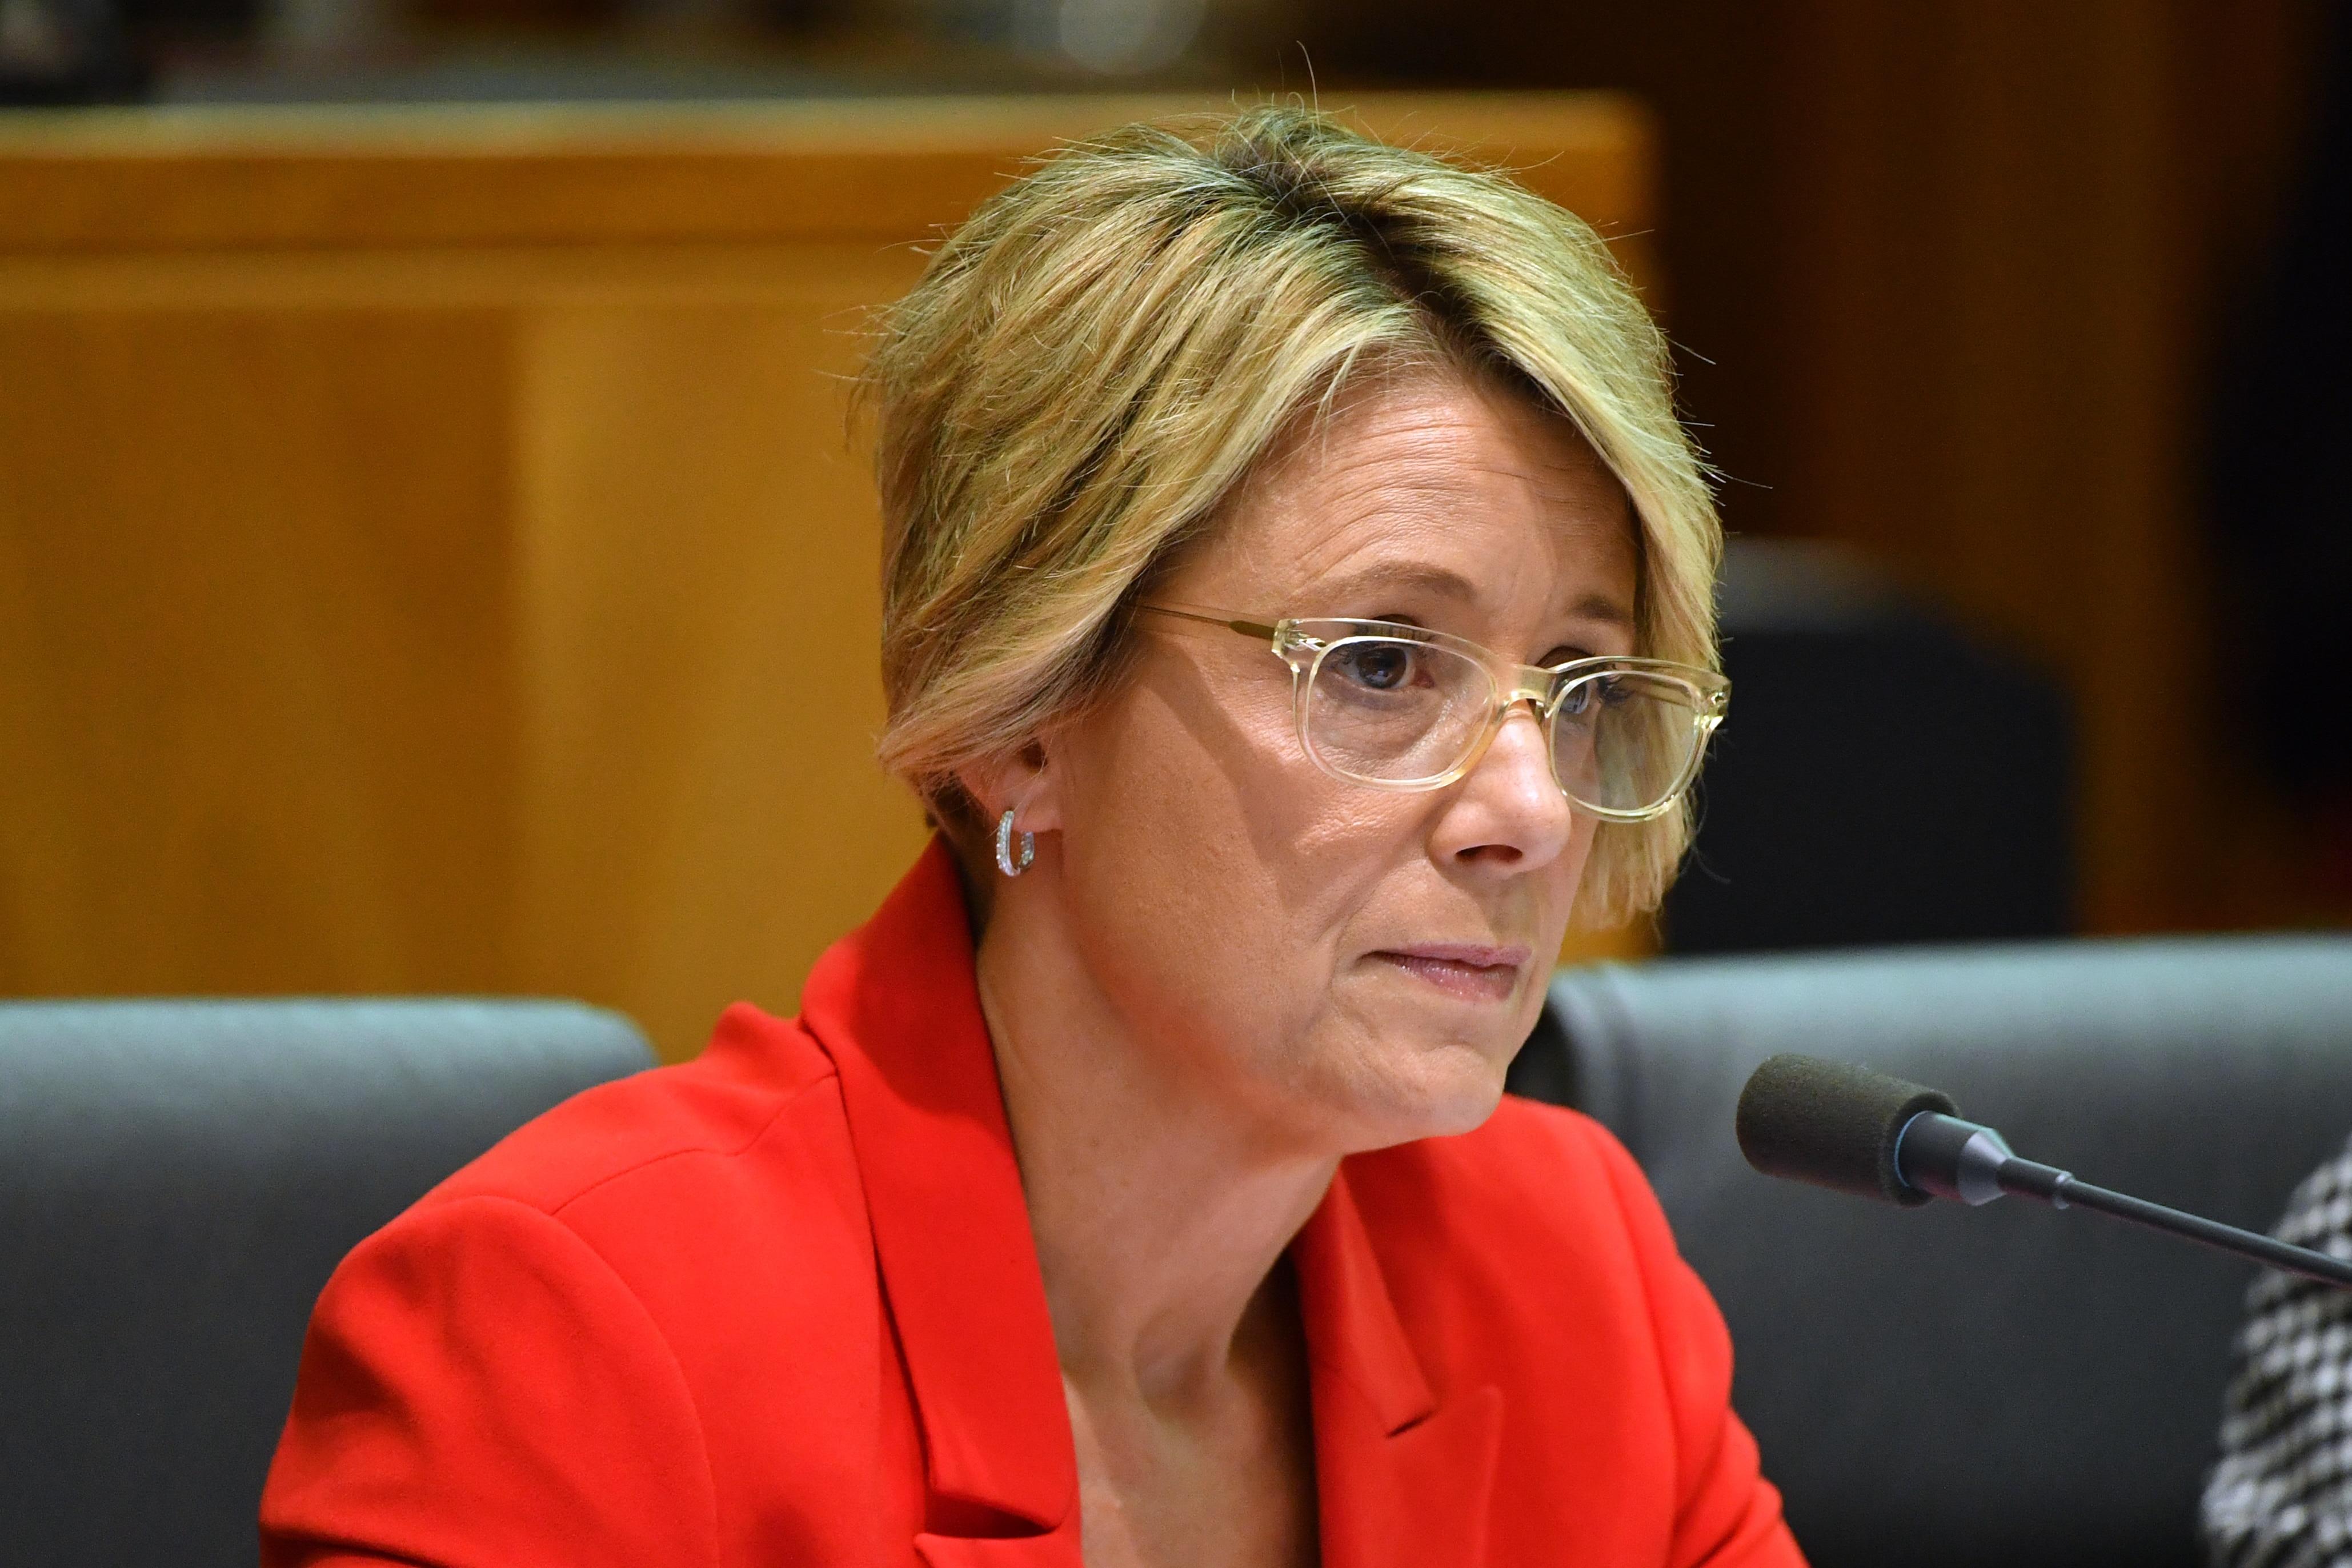 Labor Senator Kristina Keneally at a Senate Estimates hearing at Parliament House in Canberra, Monday,